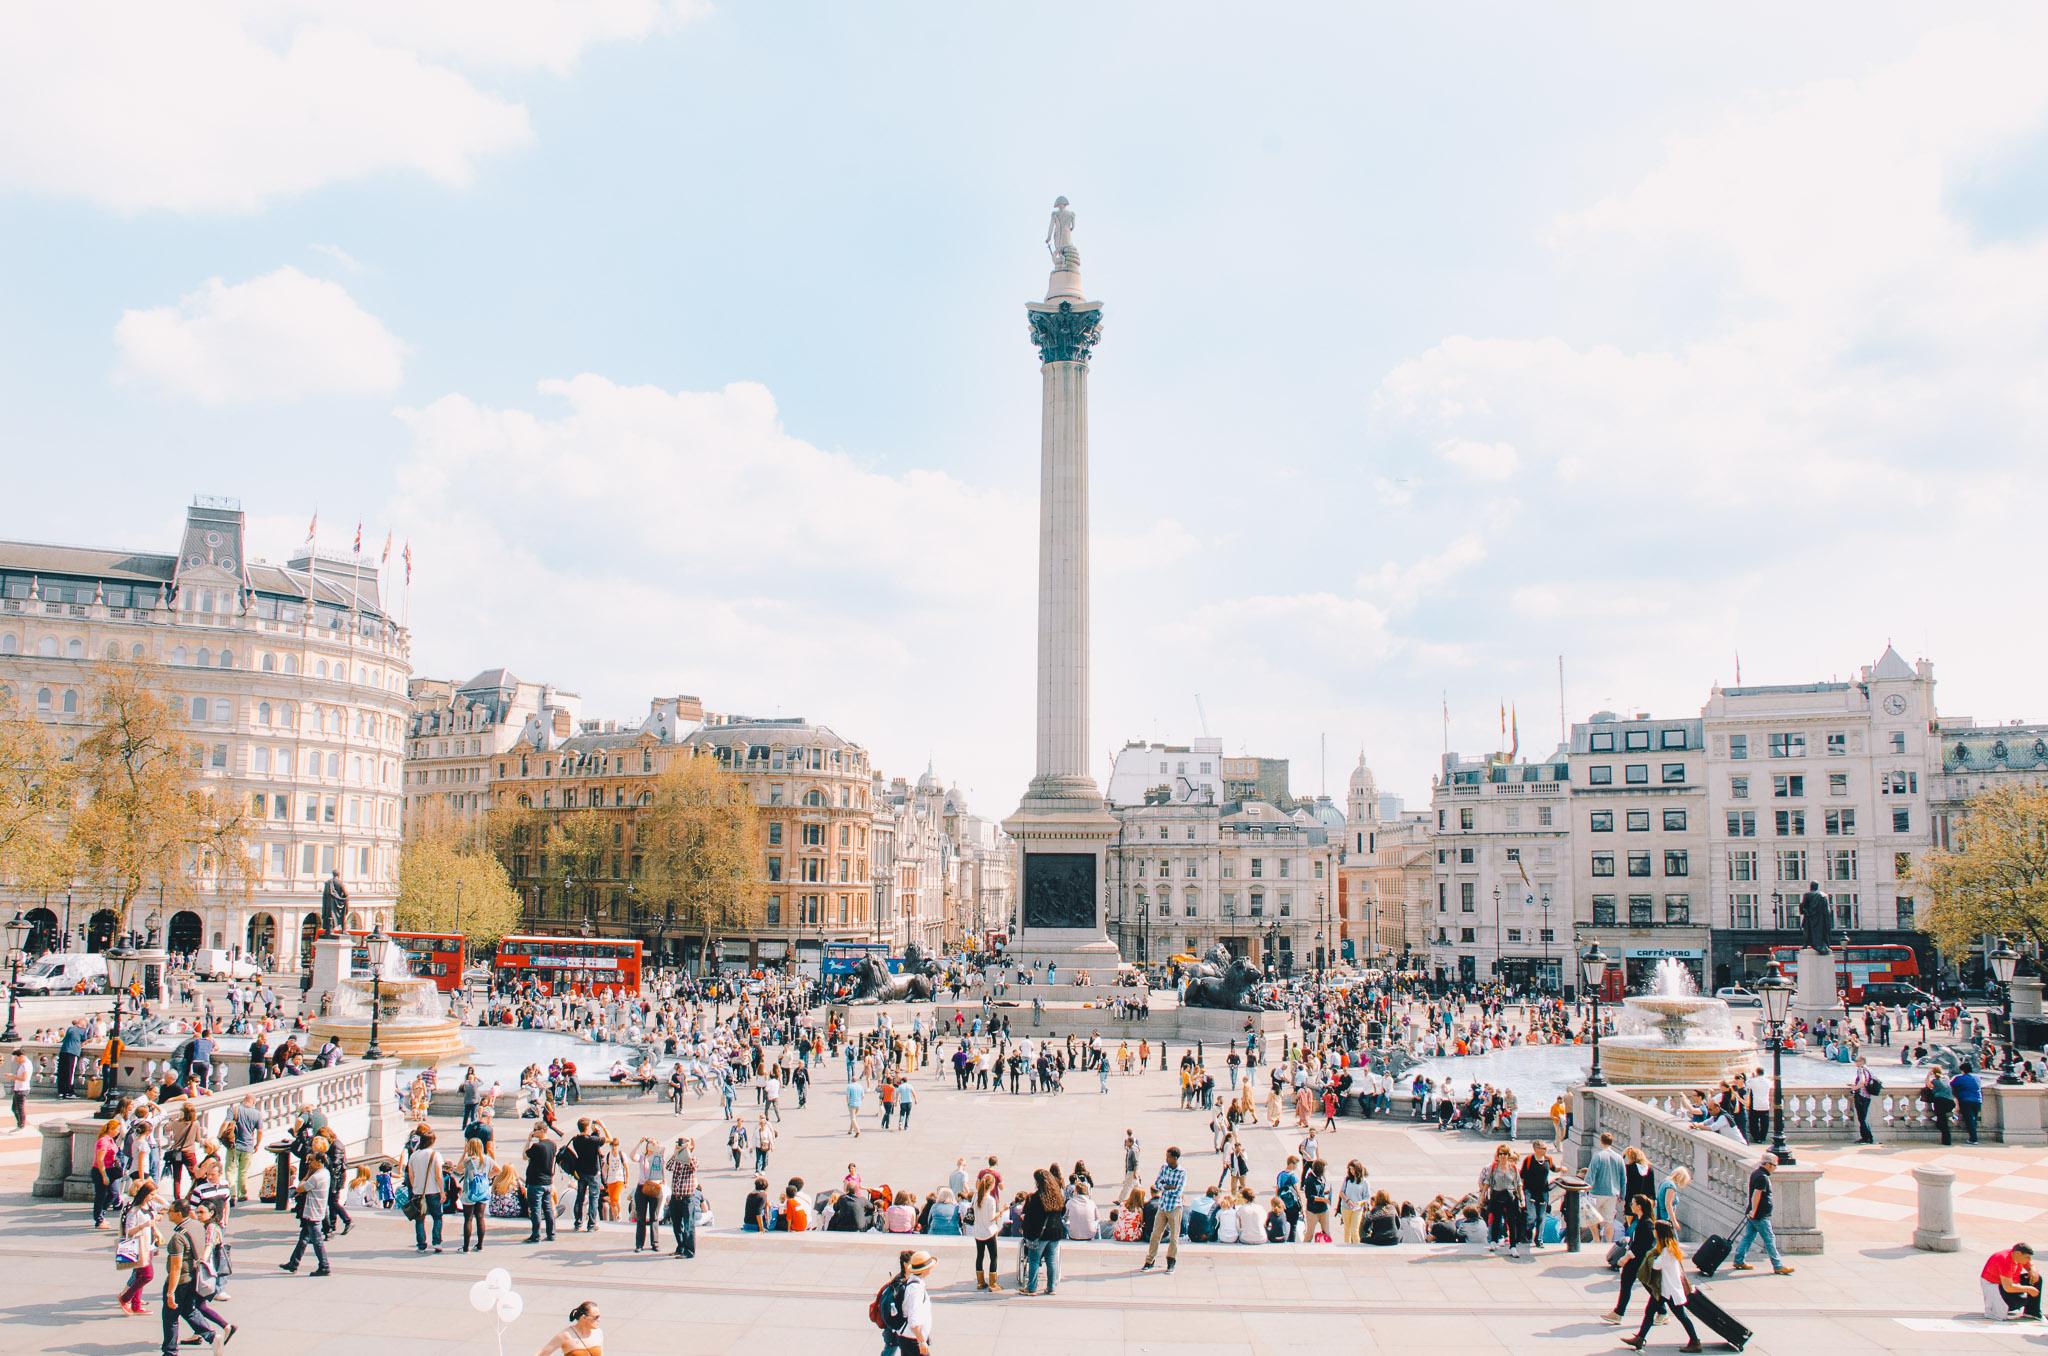 united-kingdon-england-london-trafalgar-square.jpg